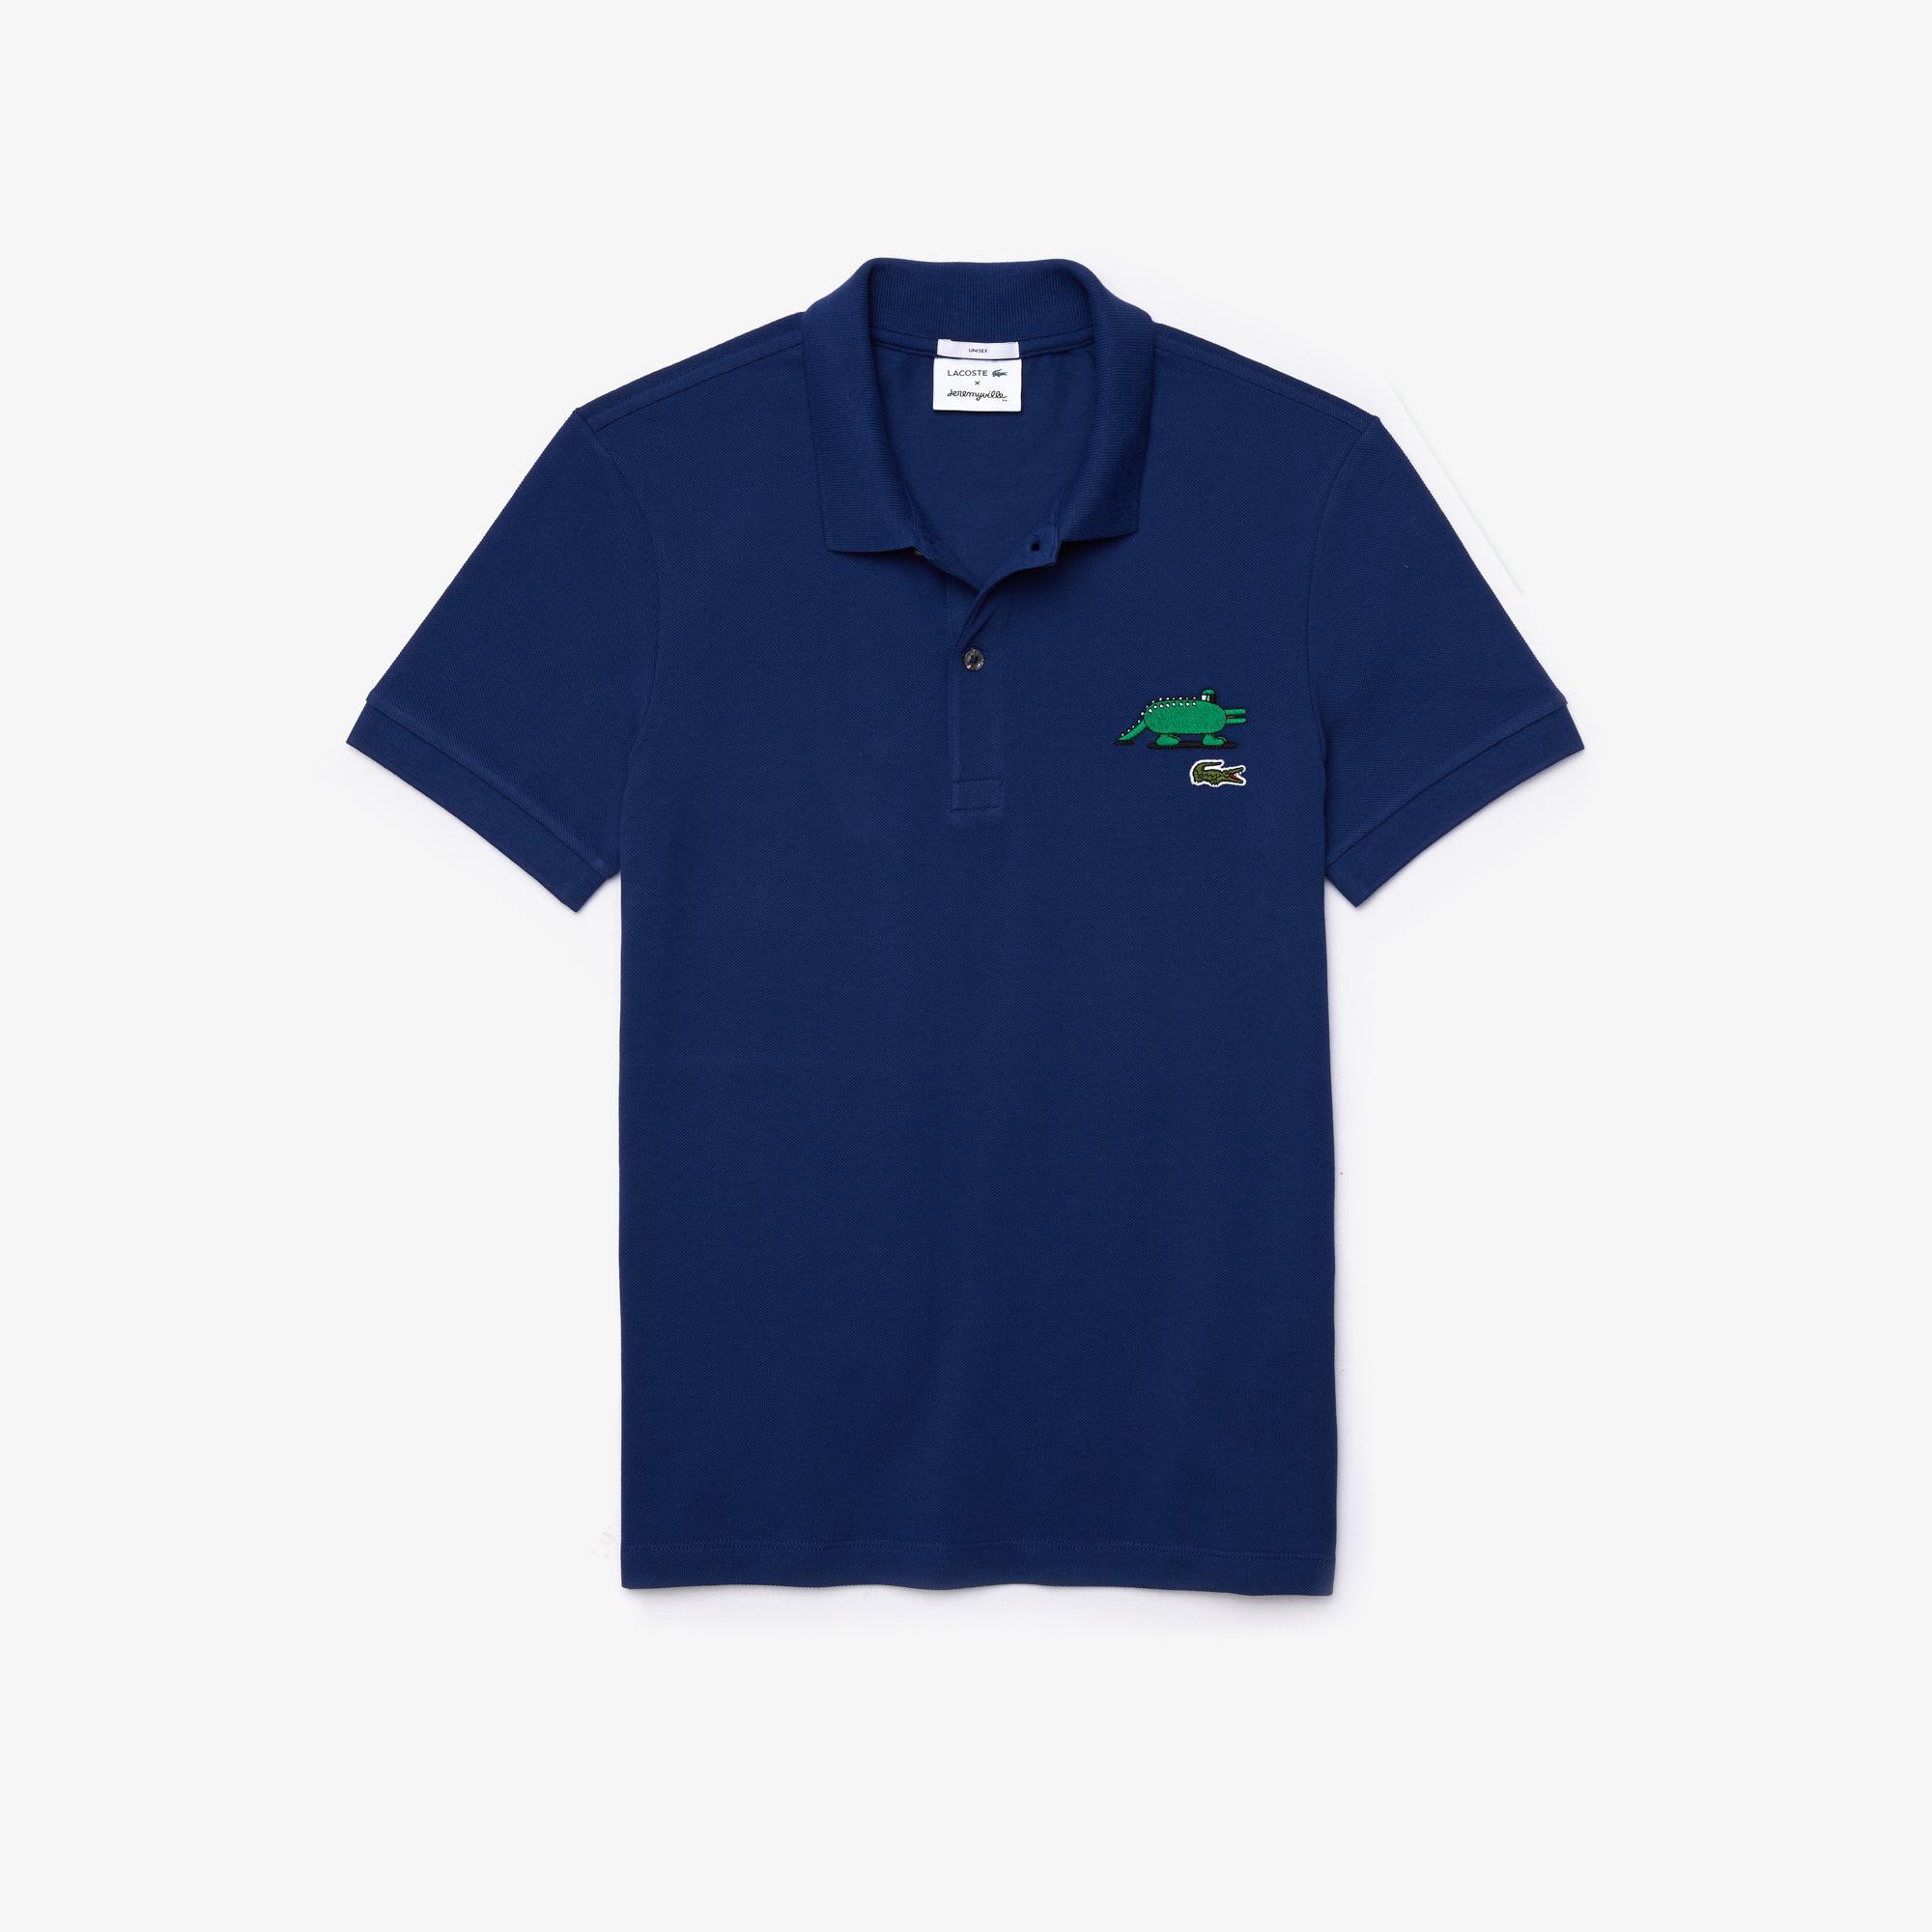 Lacoste X Jeremyville Unisex Baskılı Saks Mavi Polo